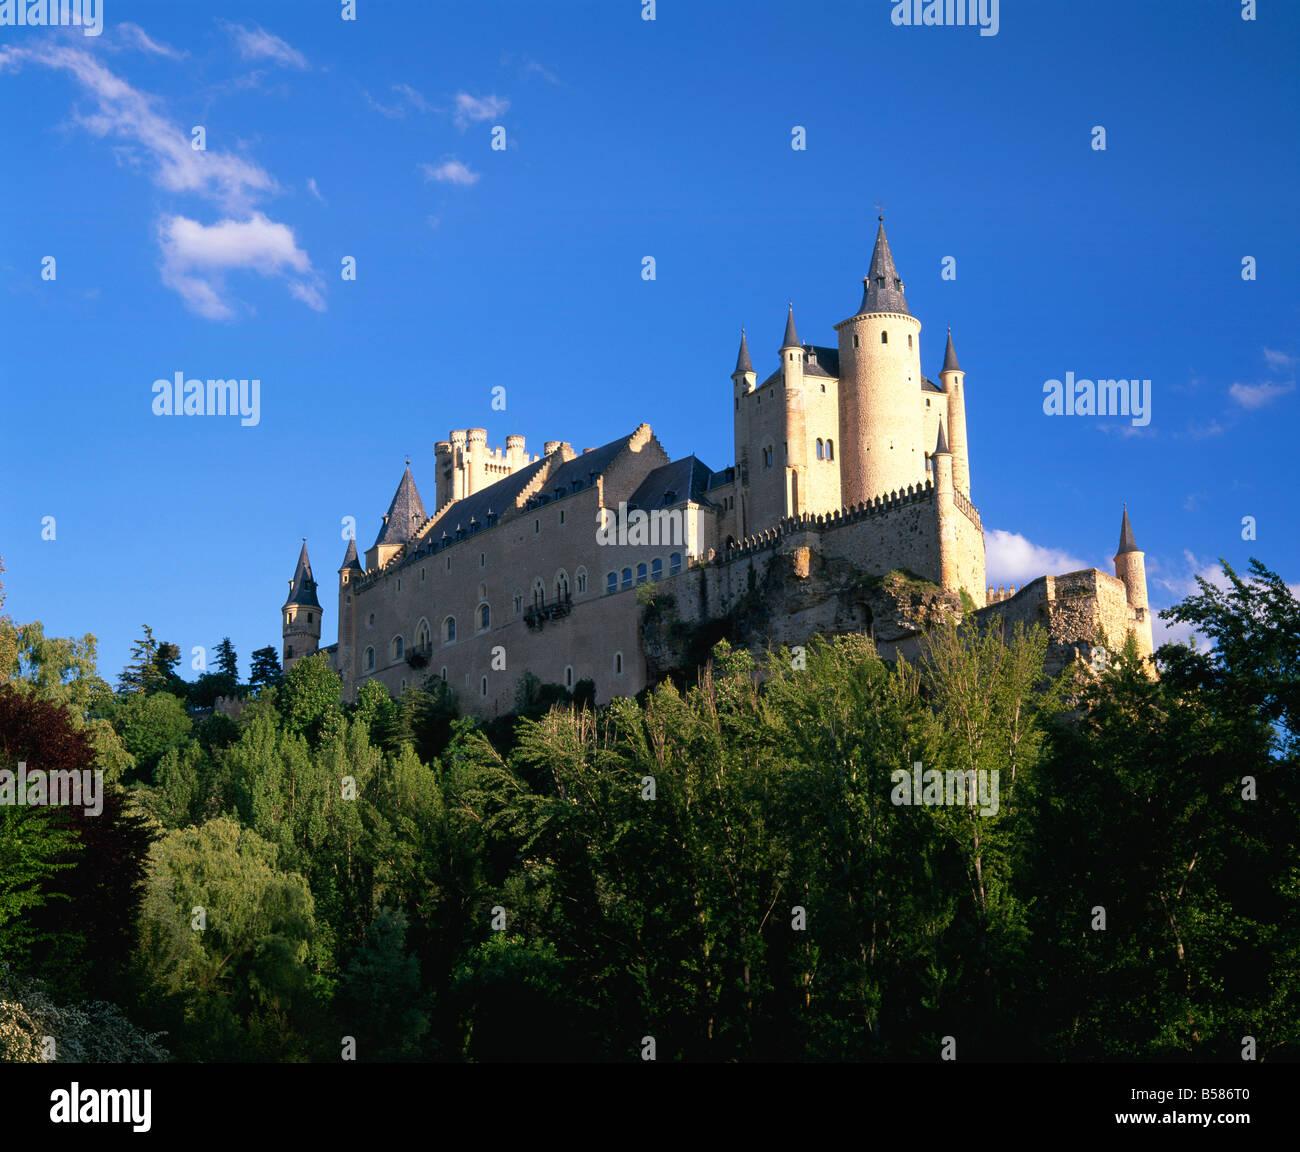 Alcazar, Segovia, Castilla y Leon (Old Castile), Spain, Europe - Stock Image